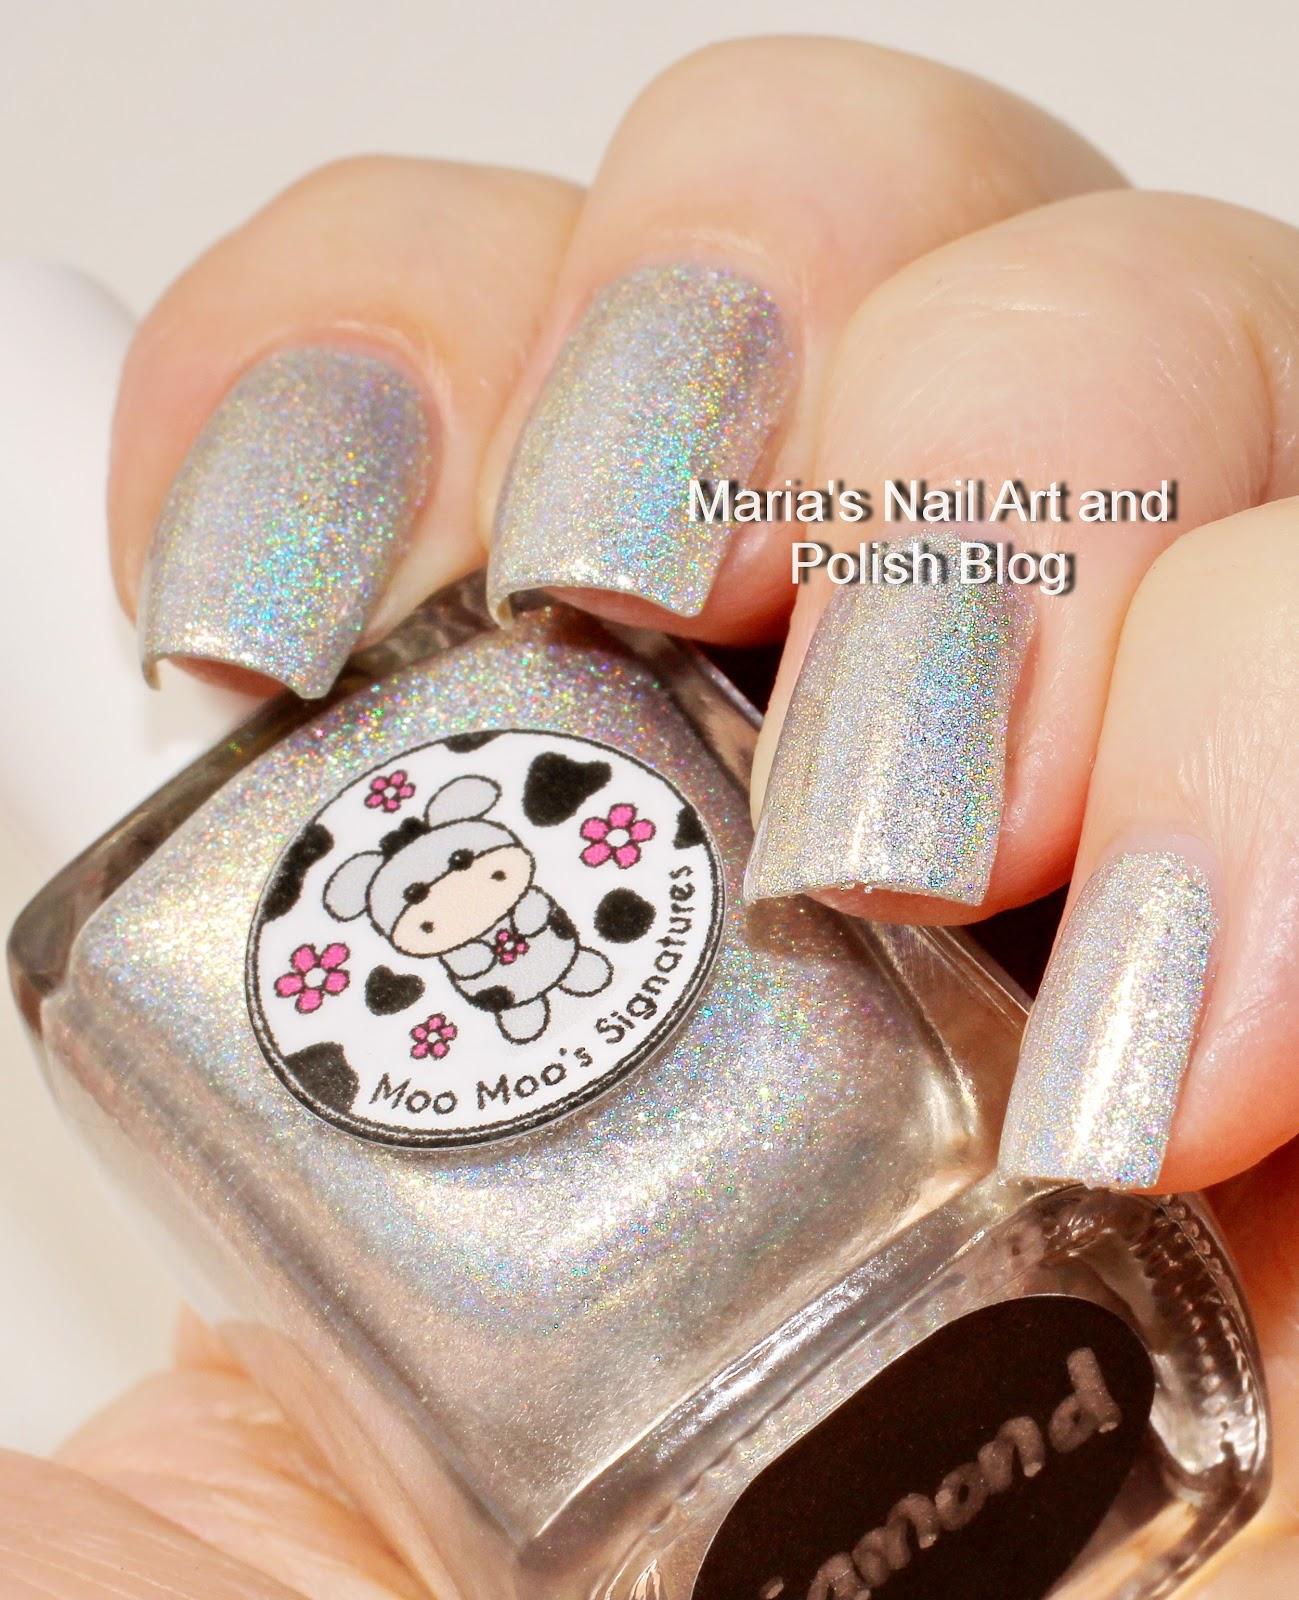 Marias Nail Art And Polish Blog Flushed With Stripes And: Marias Nail Art And Polish Blog: Moo Moo's Signatures